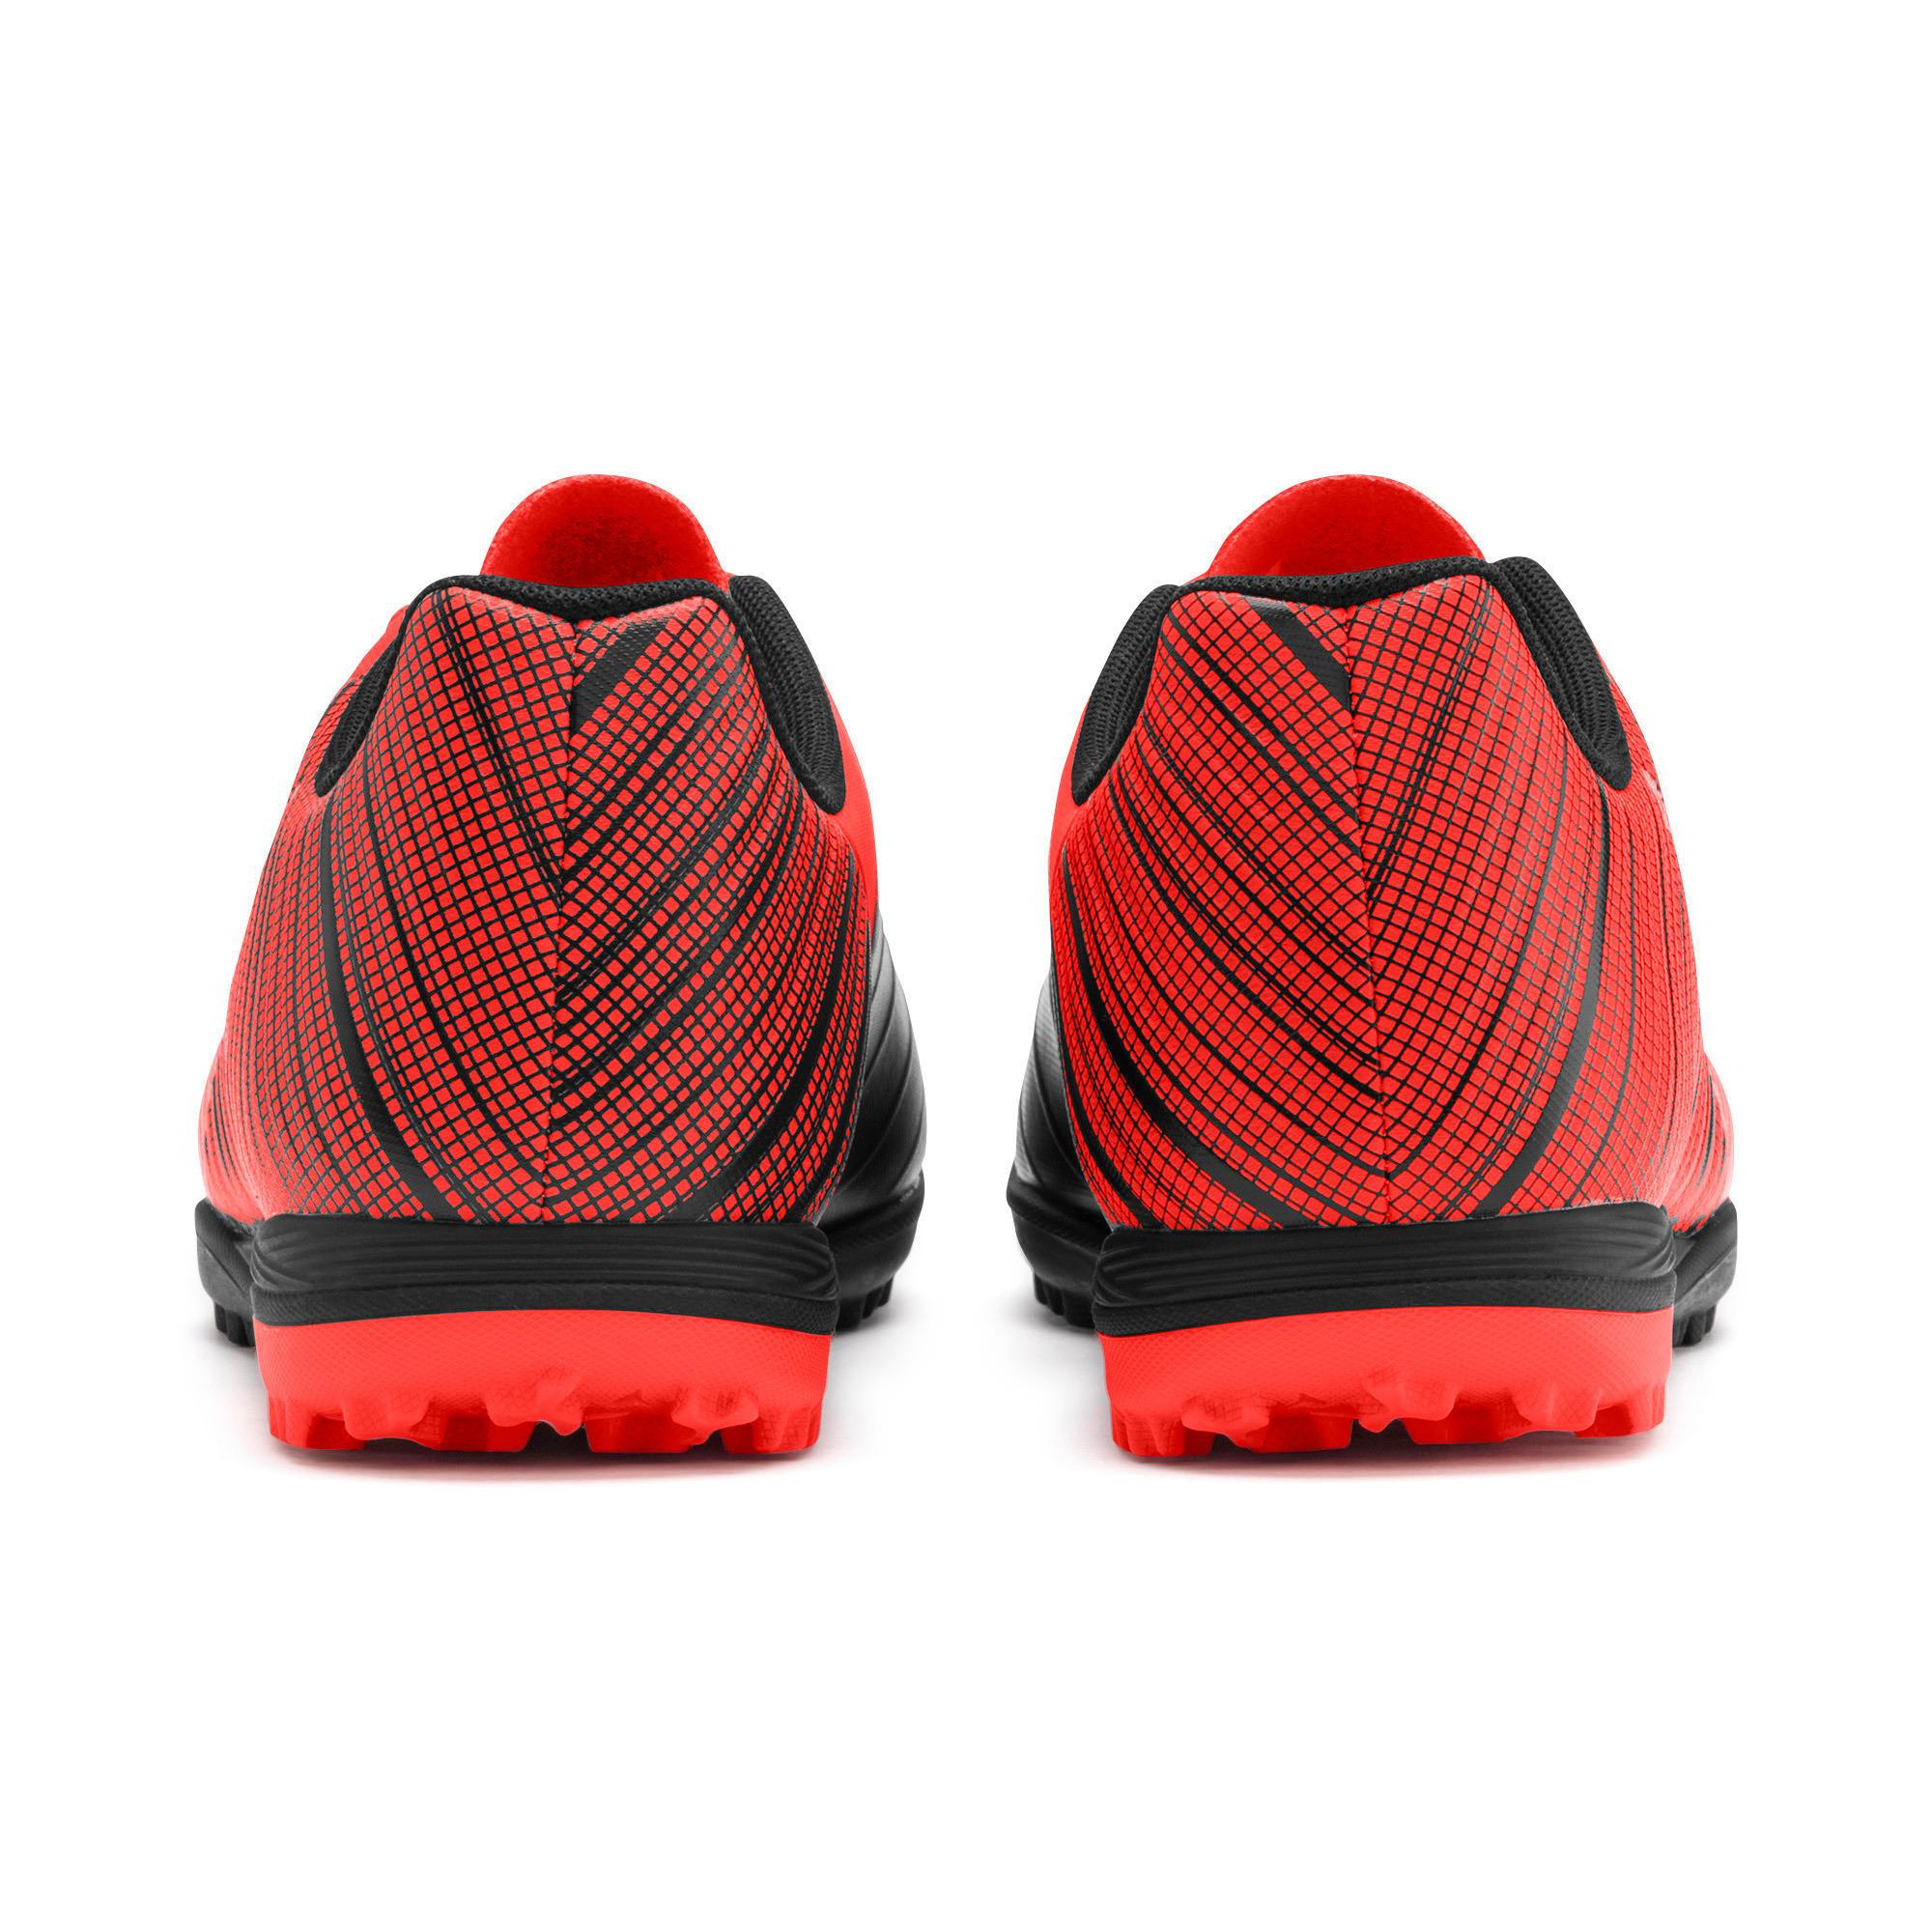 Thumbnail 4 of PUMA ONE 5.4 TT Men's Soccer Shoes, Black-Nrgy Red-Aged Silver, medium